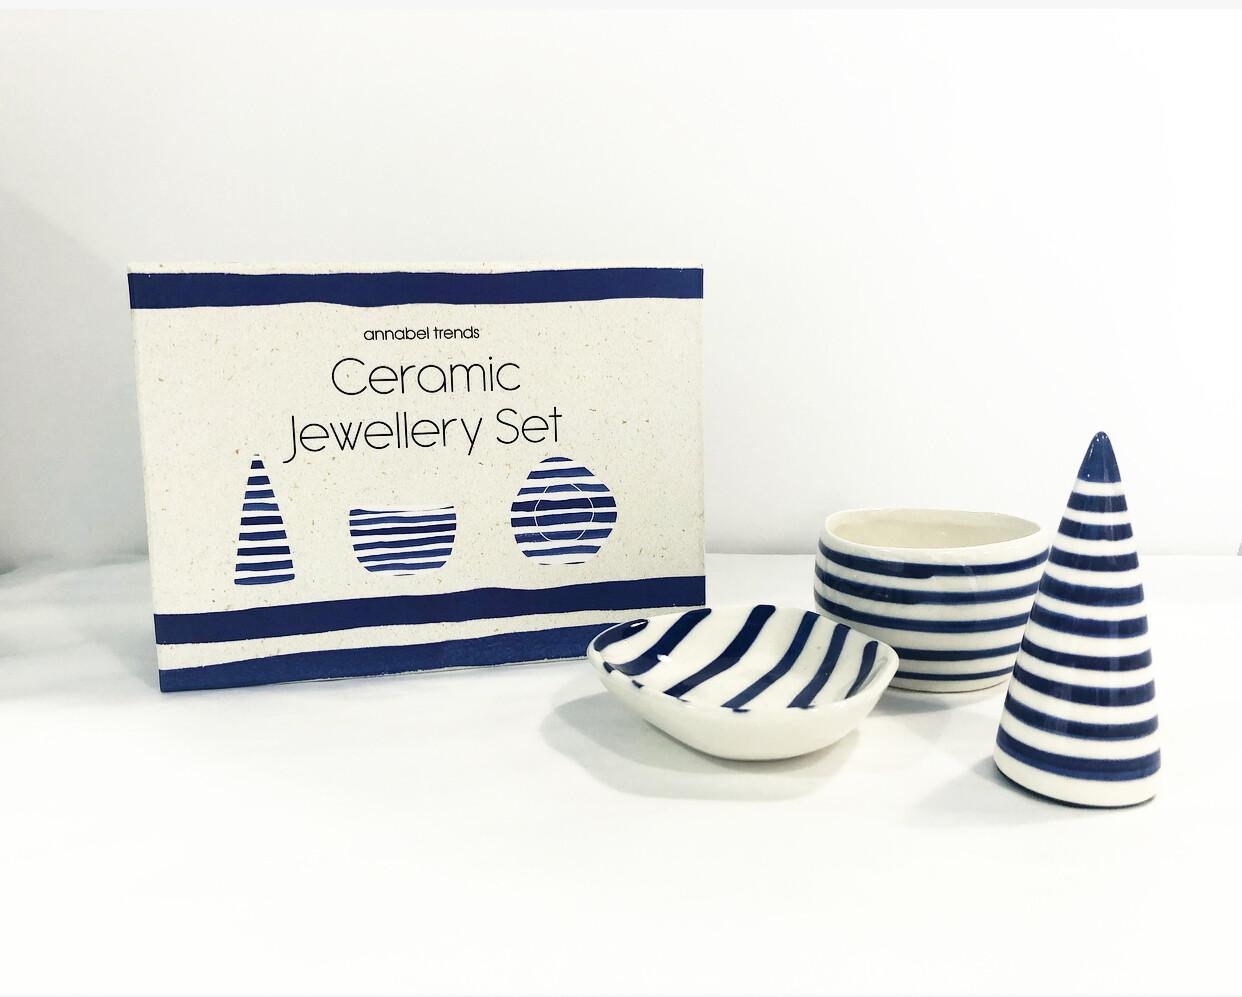 ANNABEL TRENDS - Ceramic Jewellery set